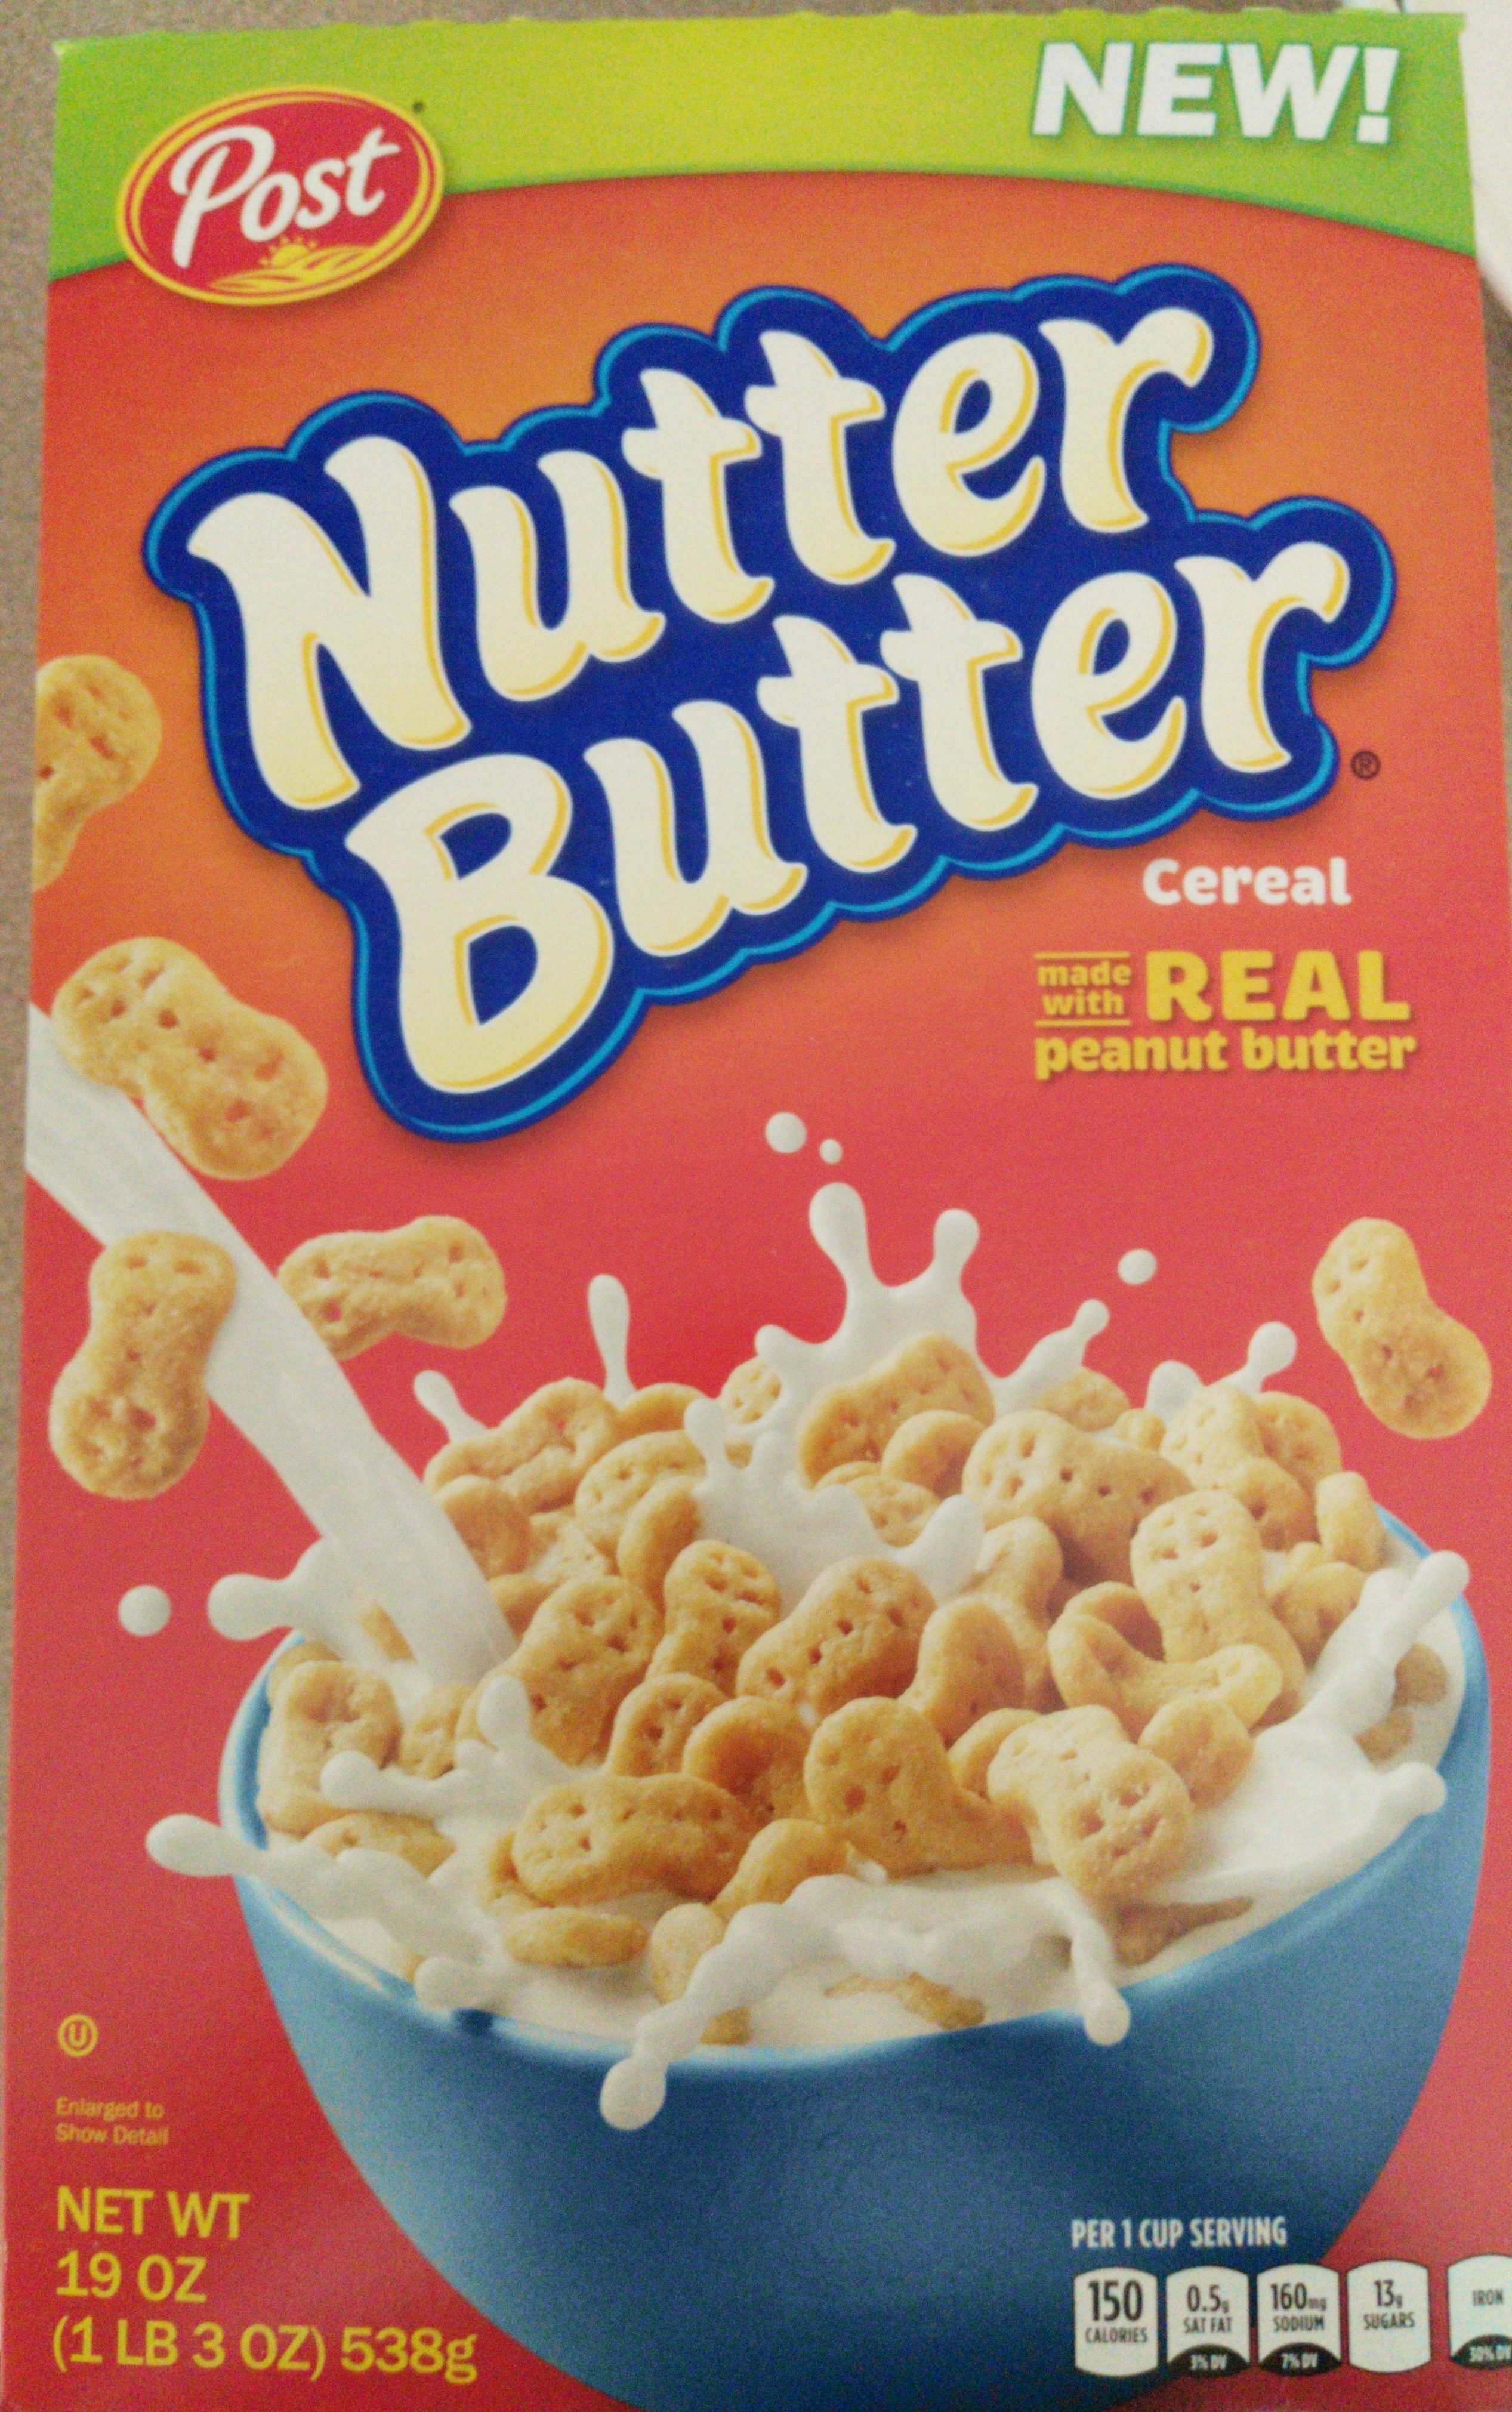 Cereal - Product - en